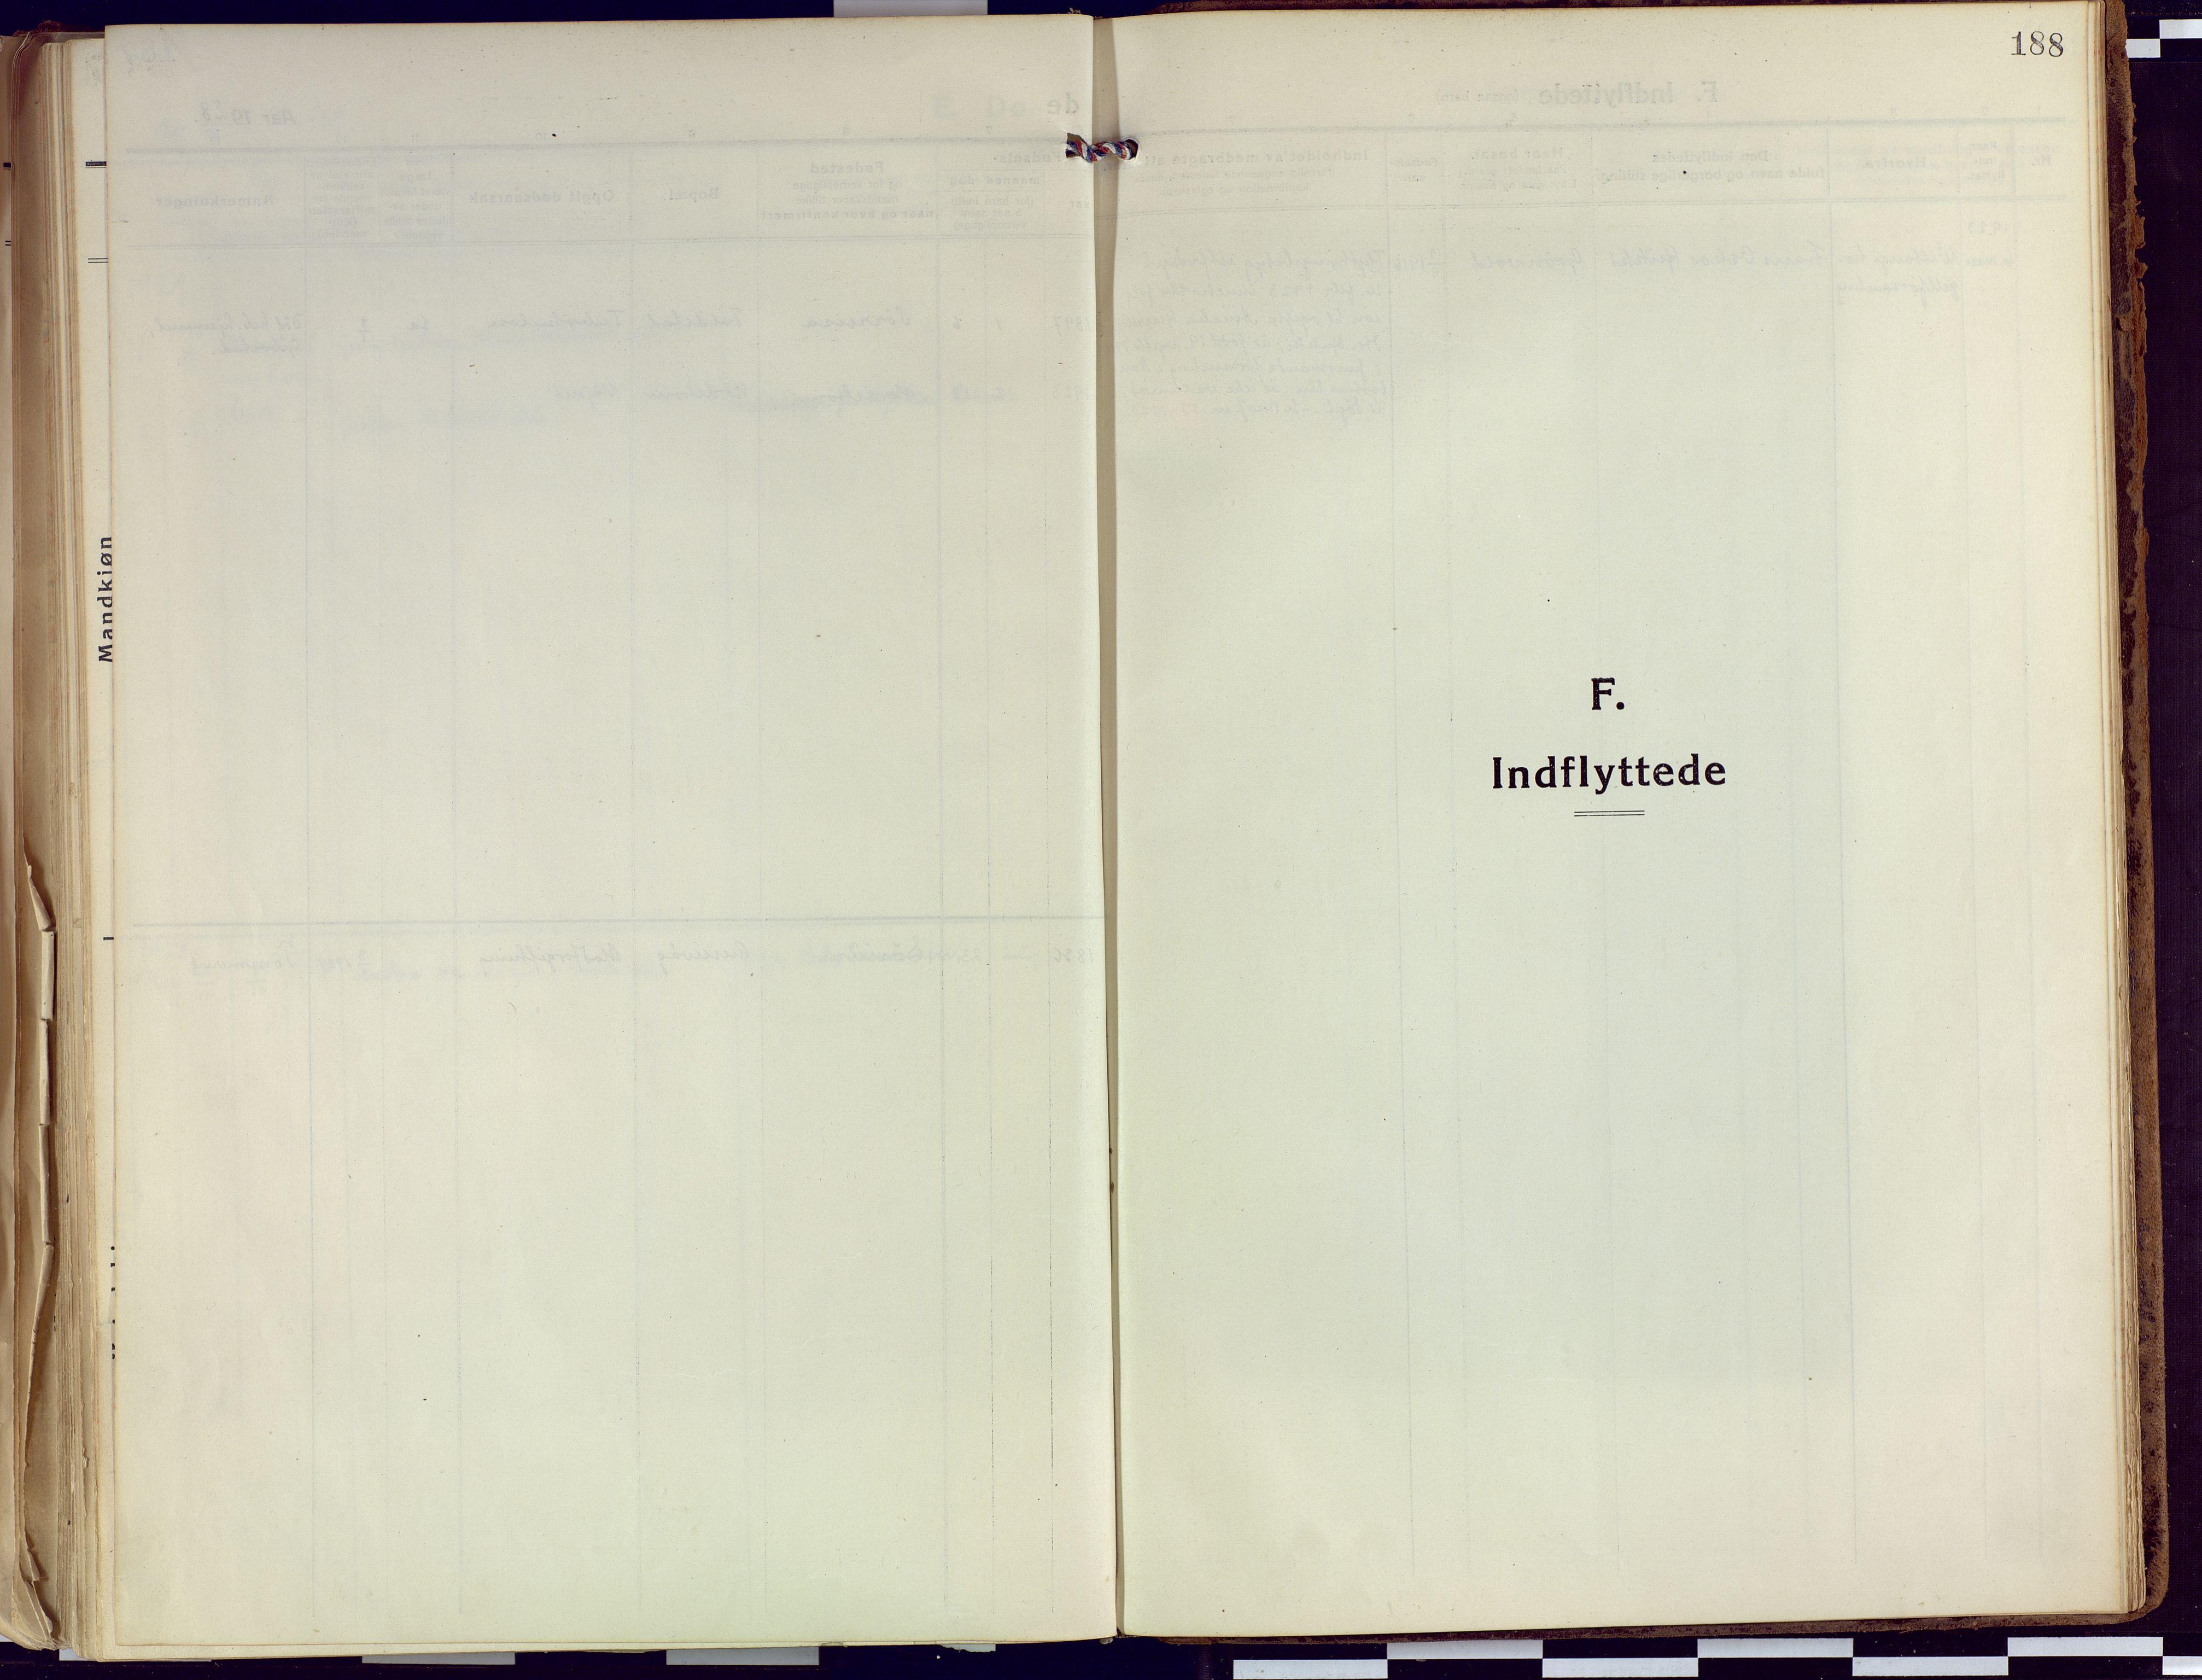 SATØ, Tranøy sokneprestkontor, I/Ia/Iaa/L0015kirke: Ministerialbok nr. 15, 1919-1928, s. 188